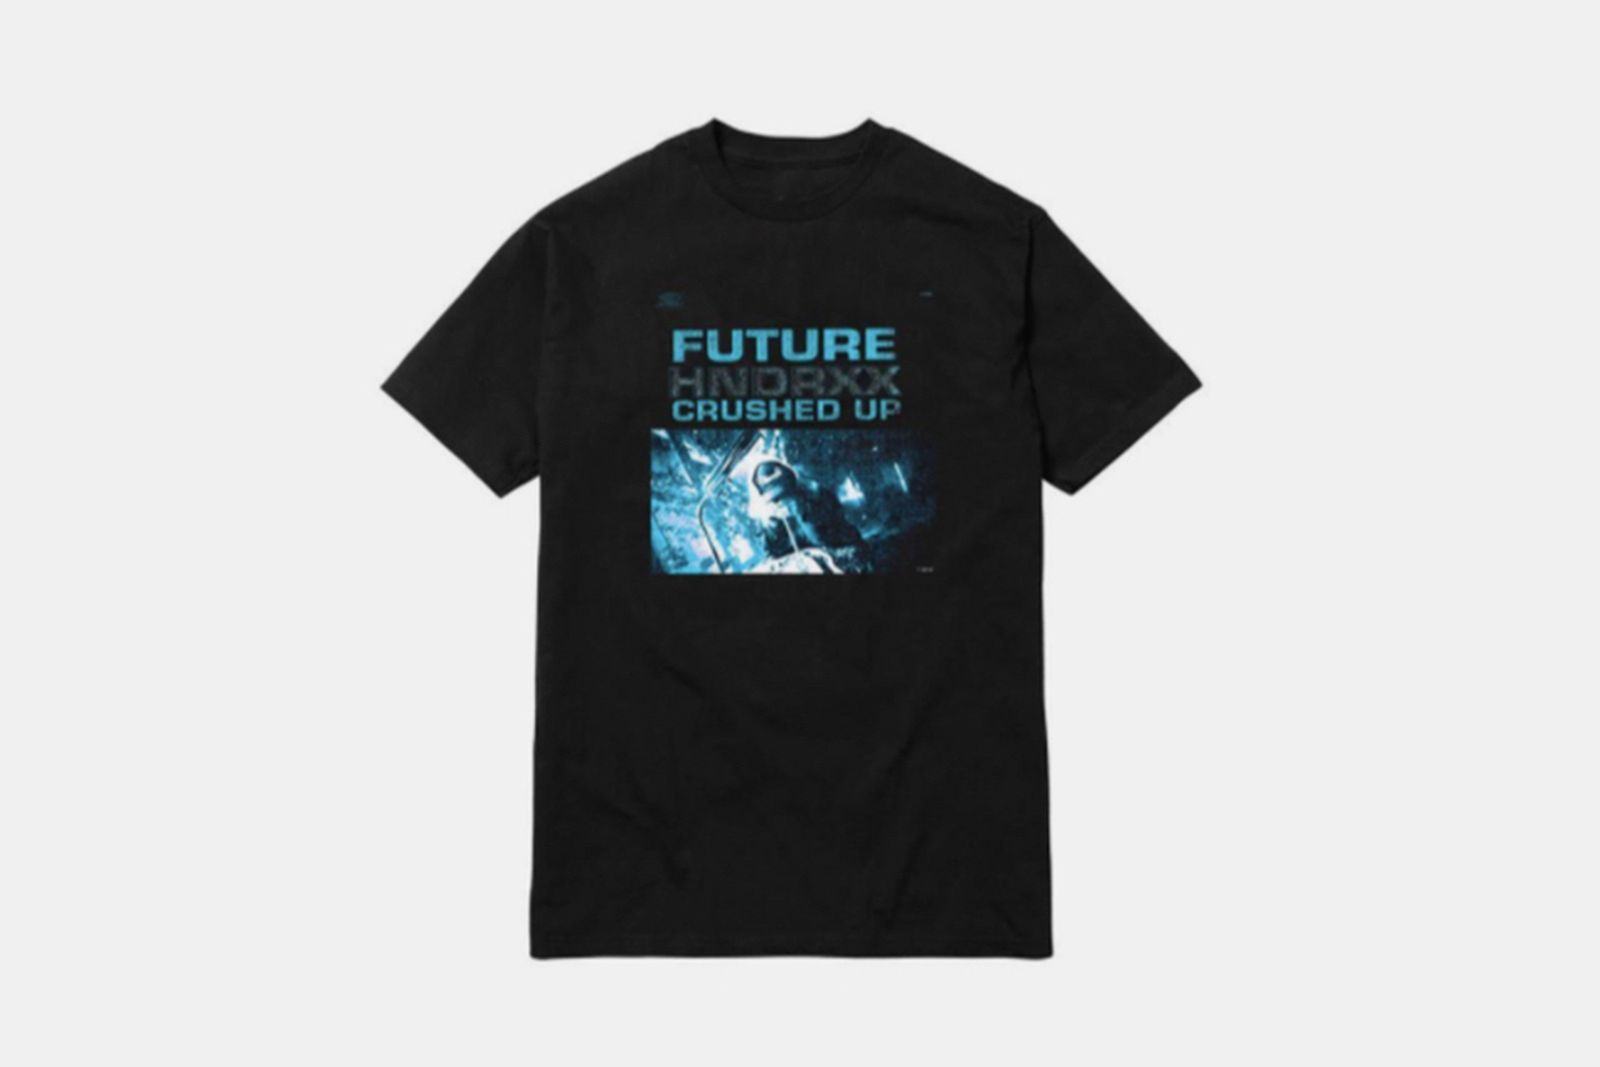 future the wizrd merch